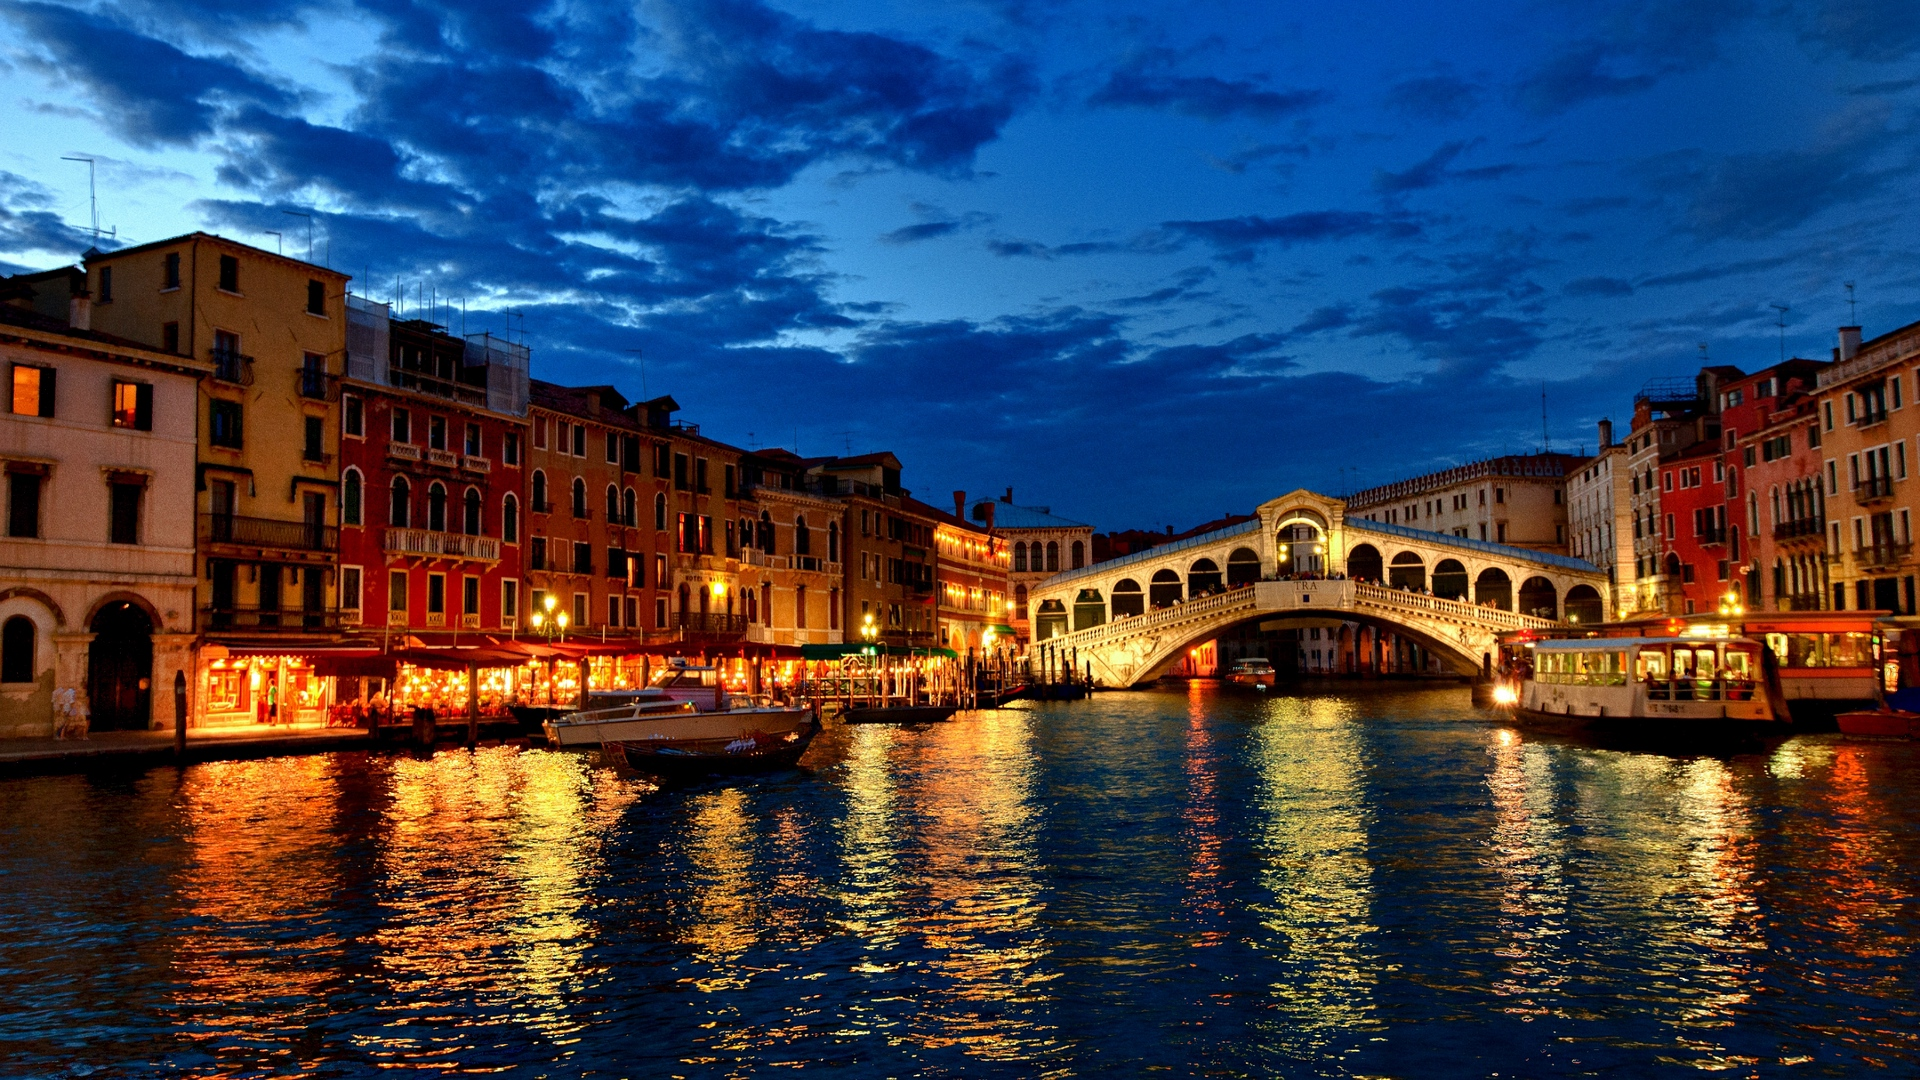 Download wallpaper 1920x1080 venice canal gondola boat night 1920x1080